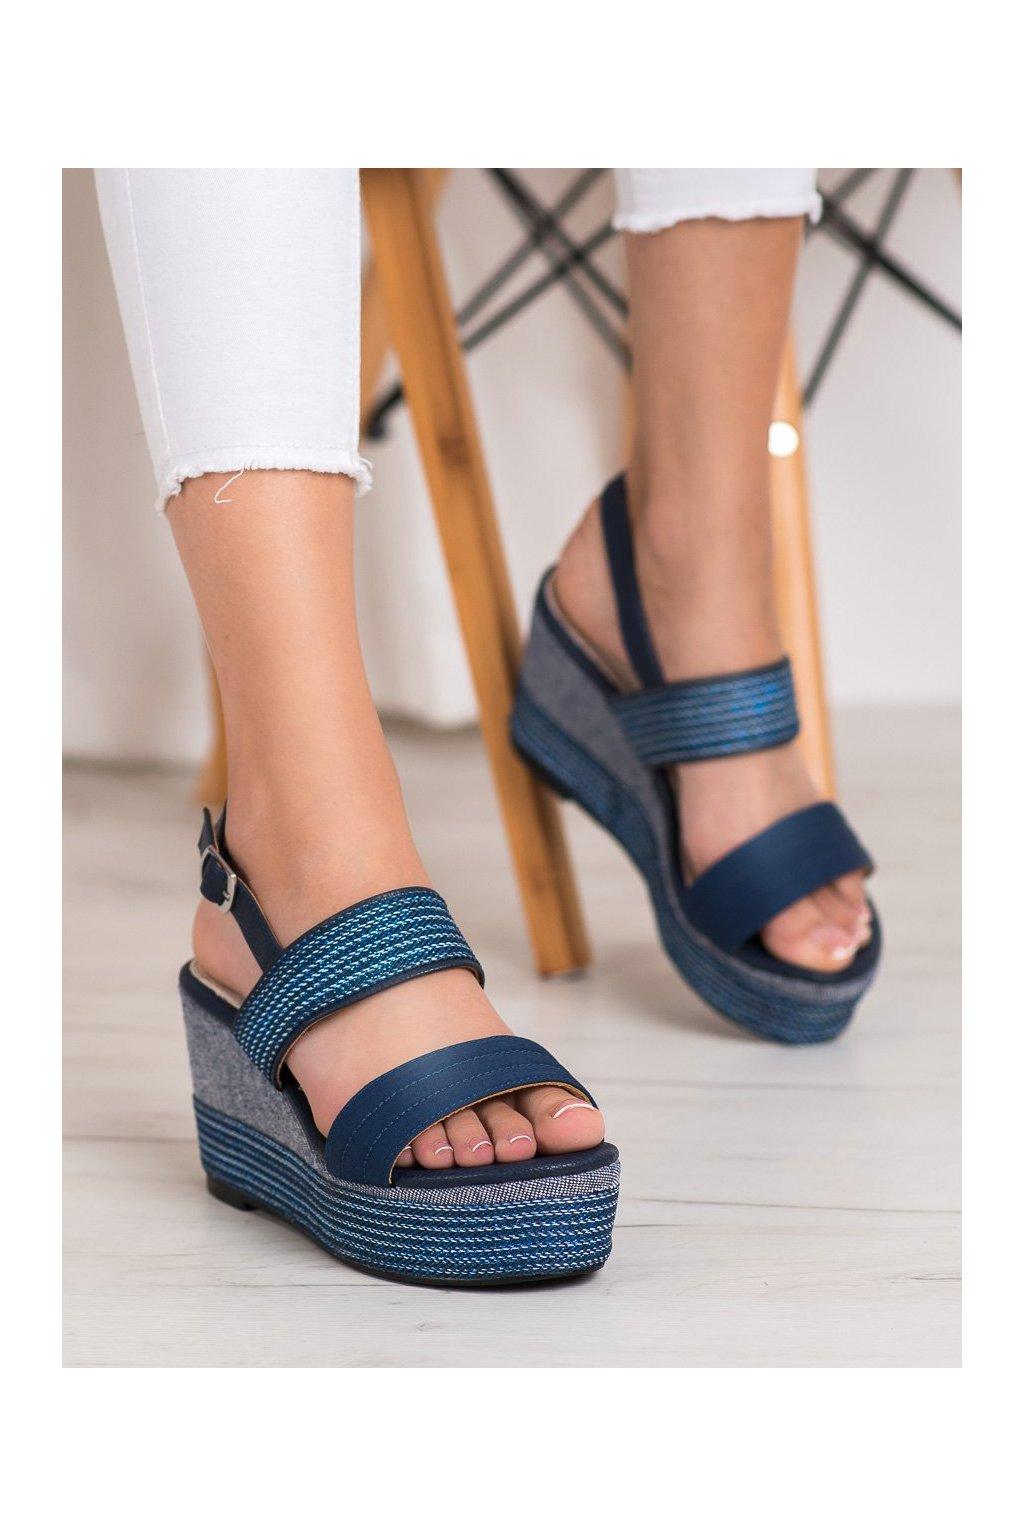 Modré sandále Goodin kod GD-NF-04N